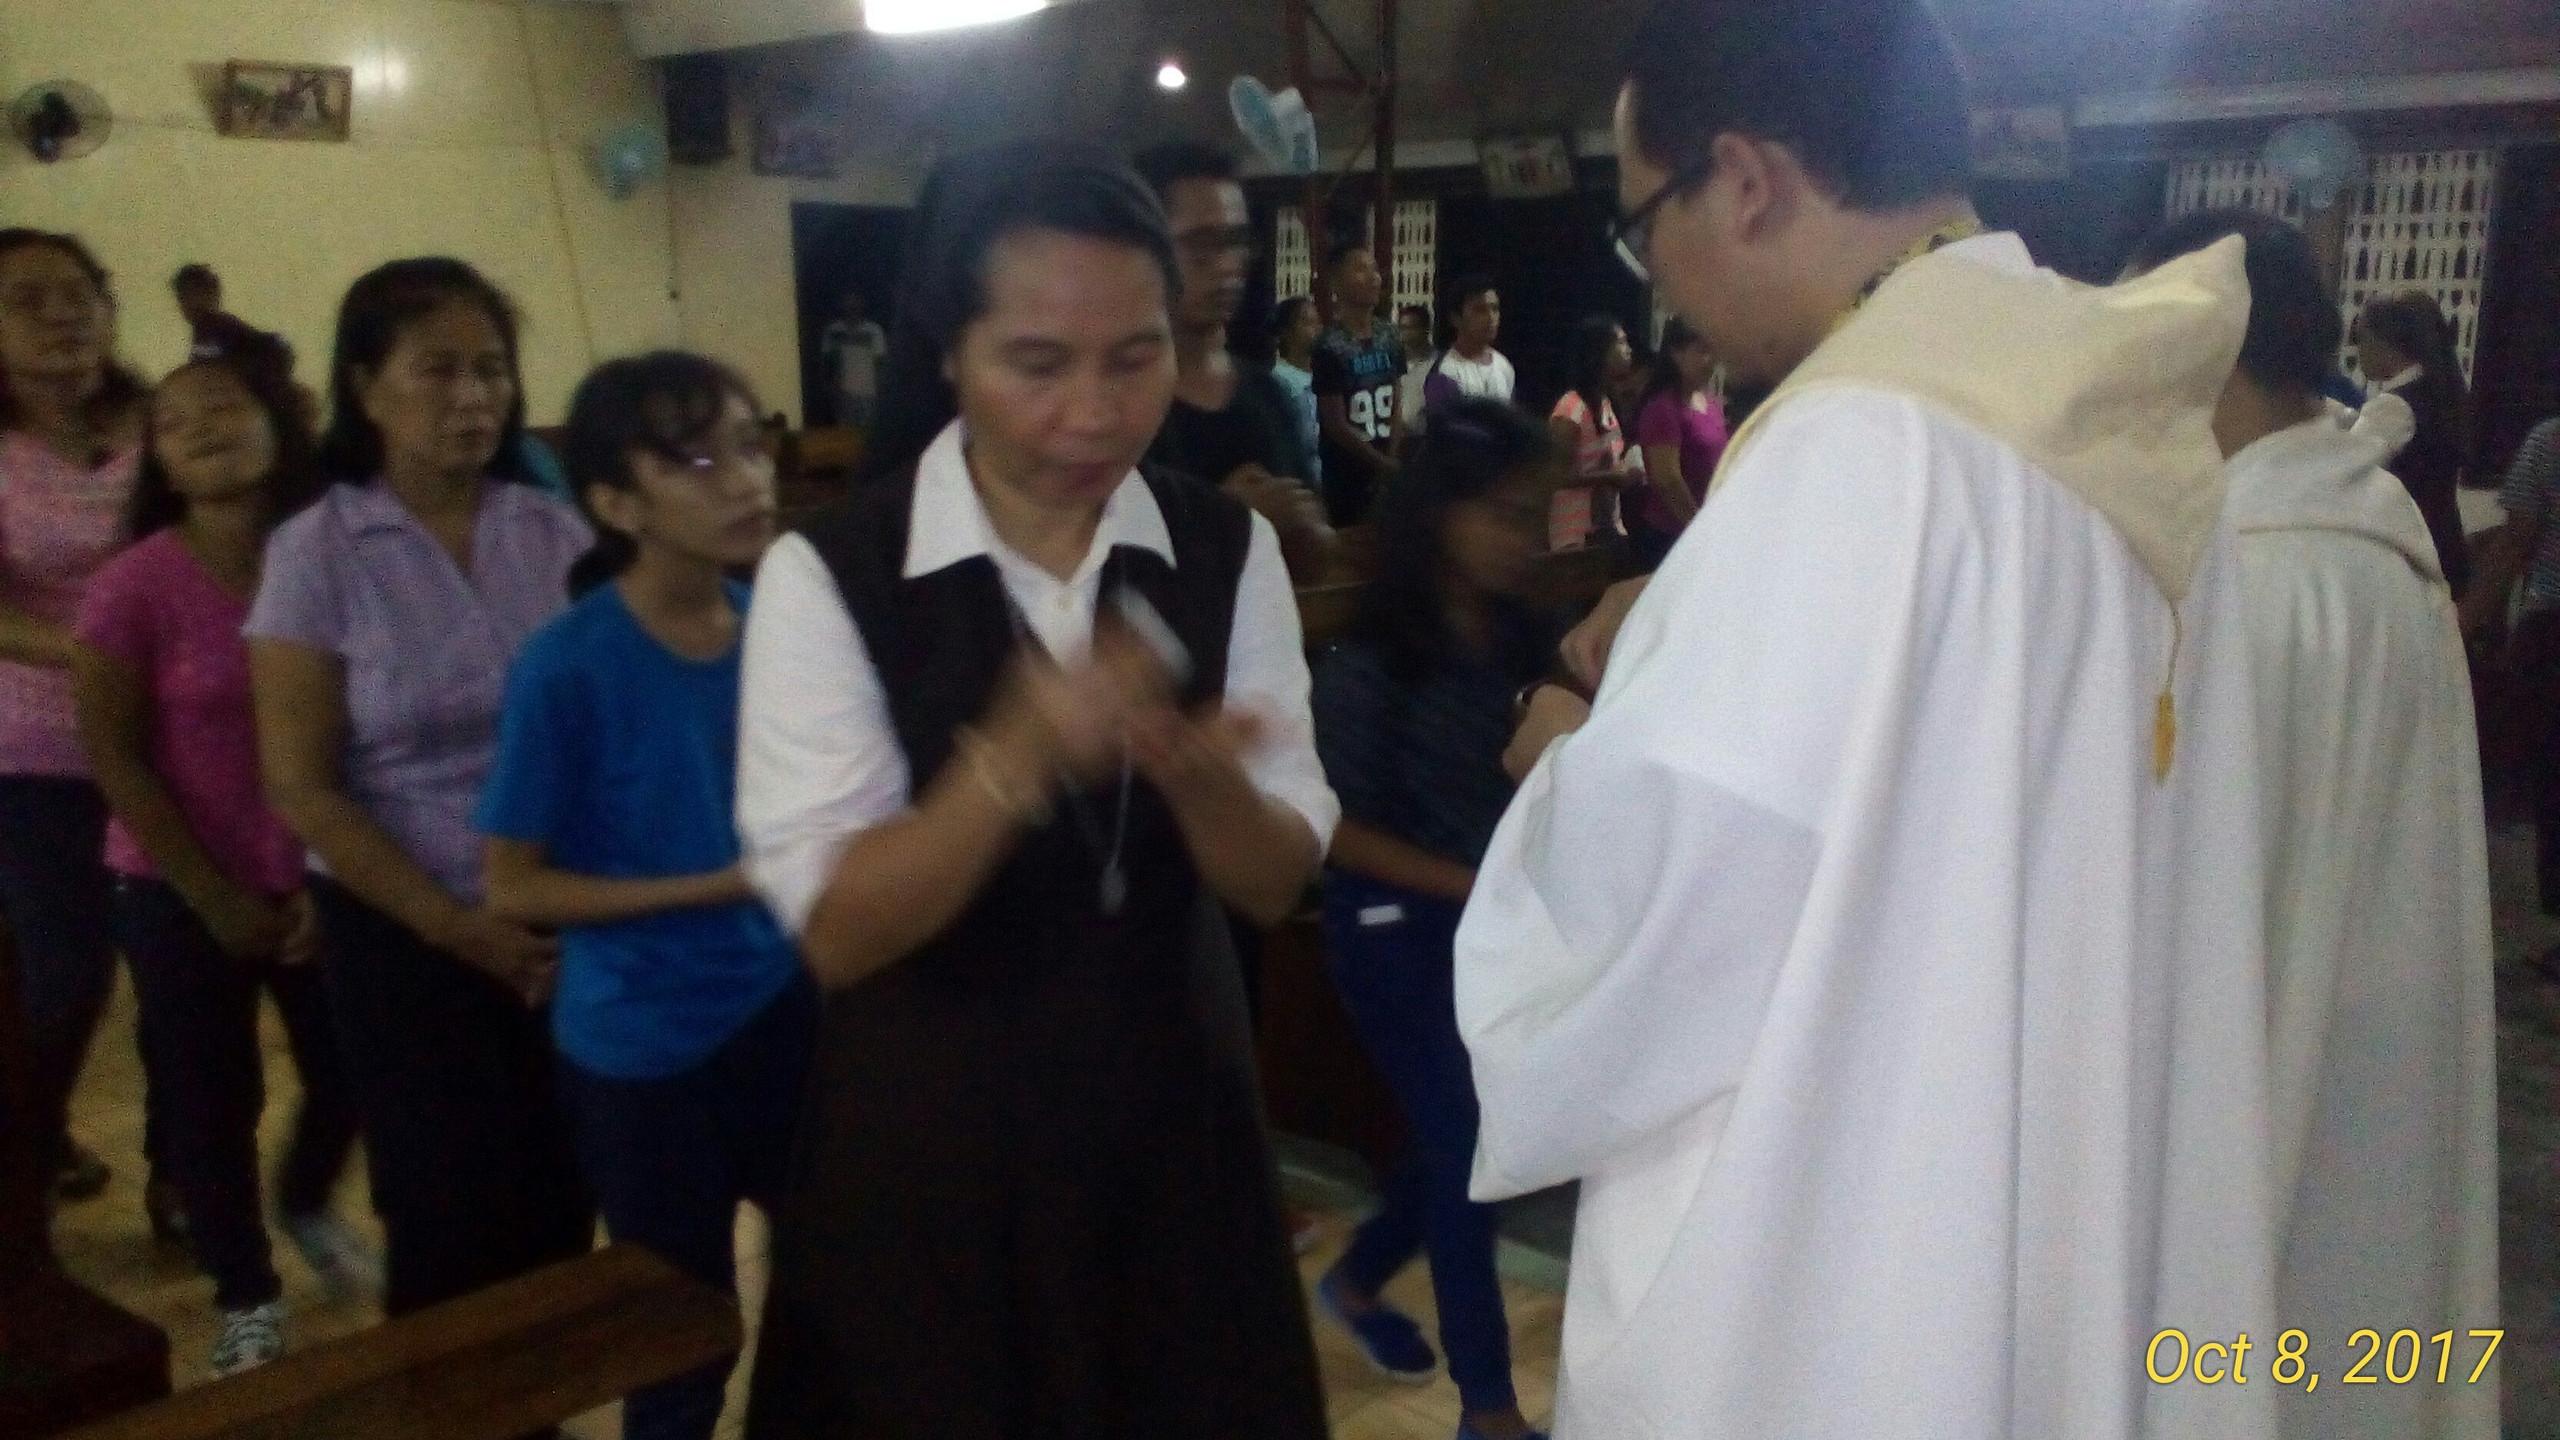 Fr. Meloy